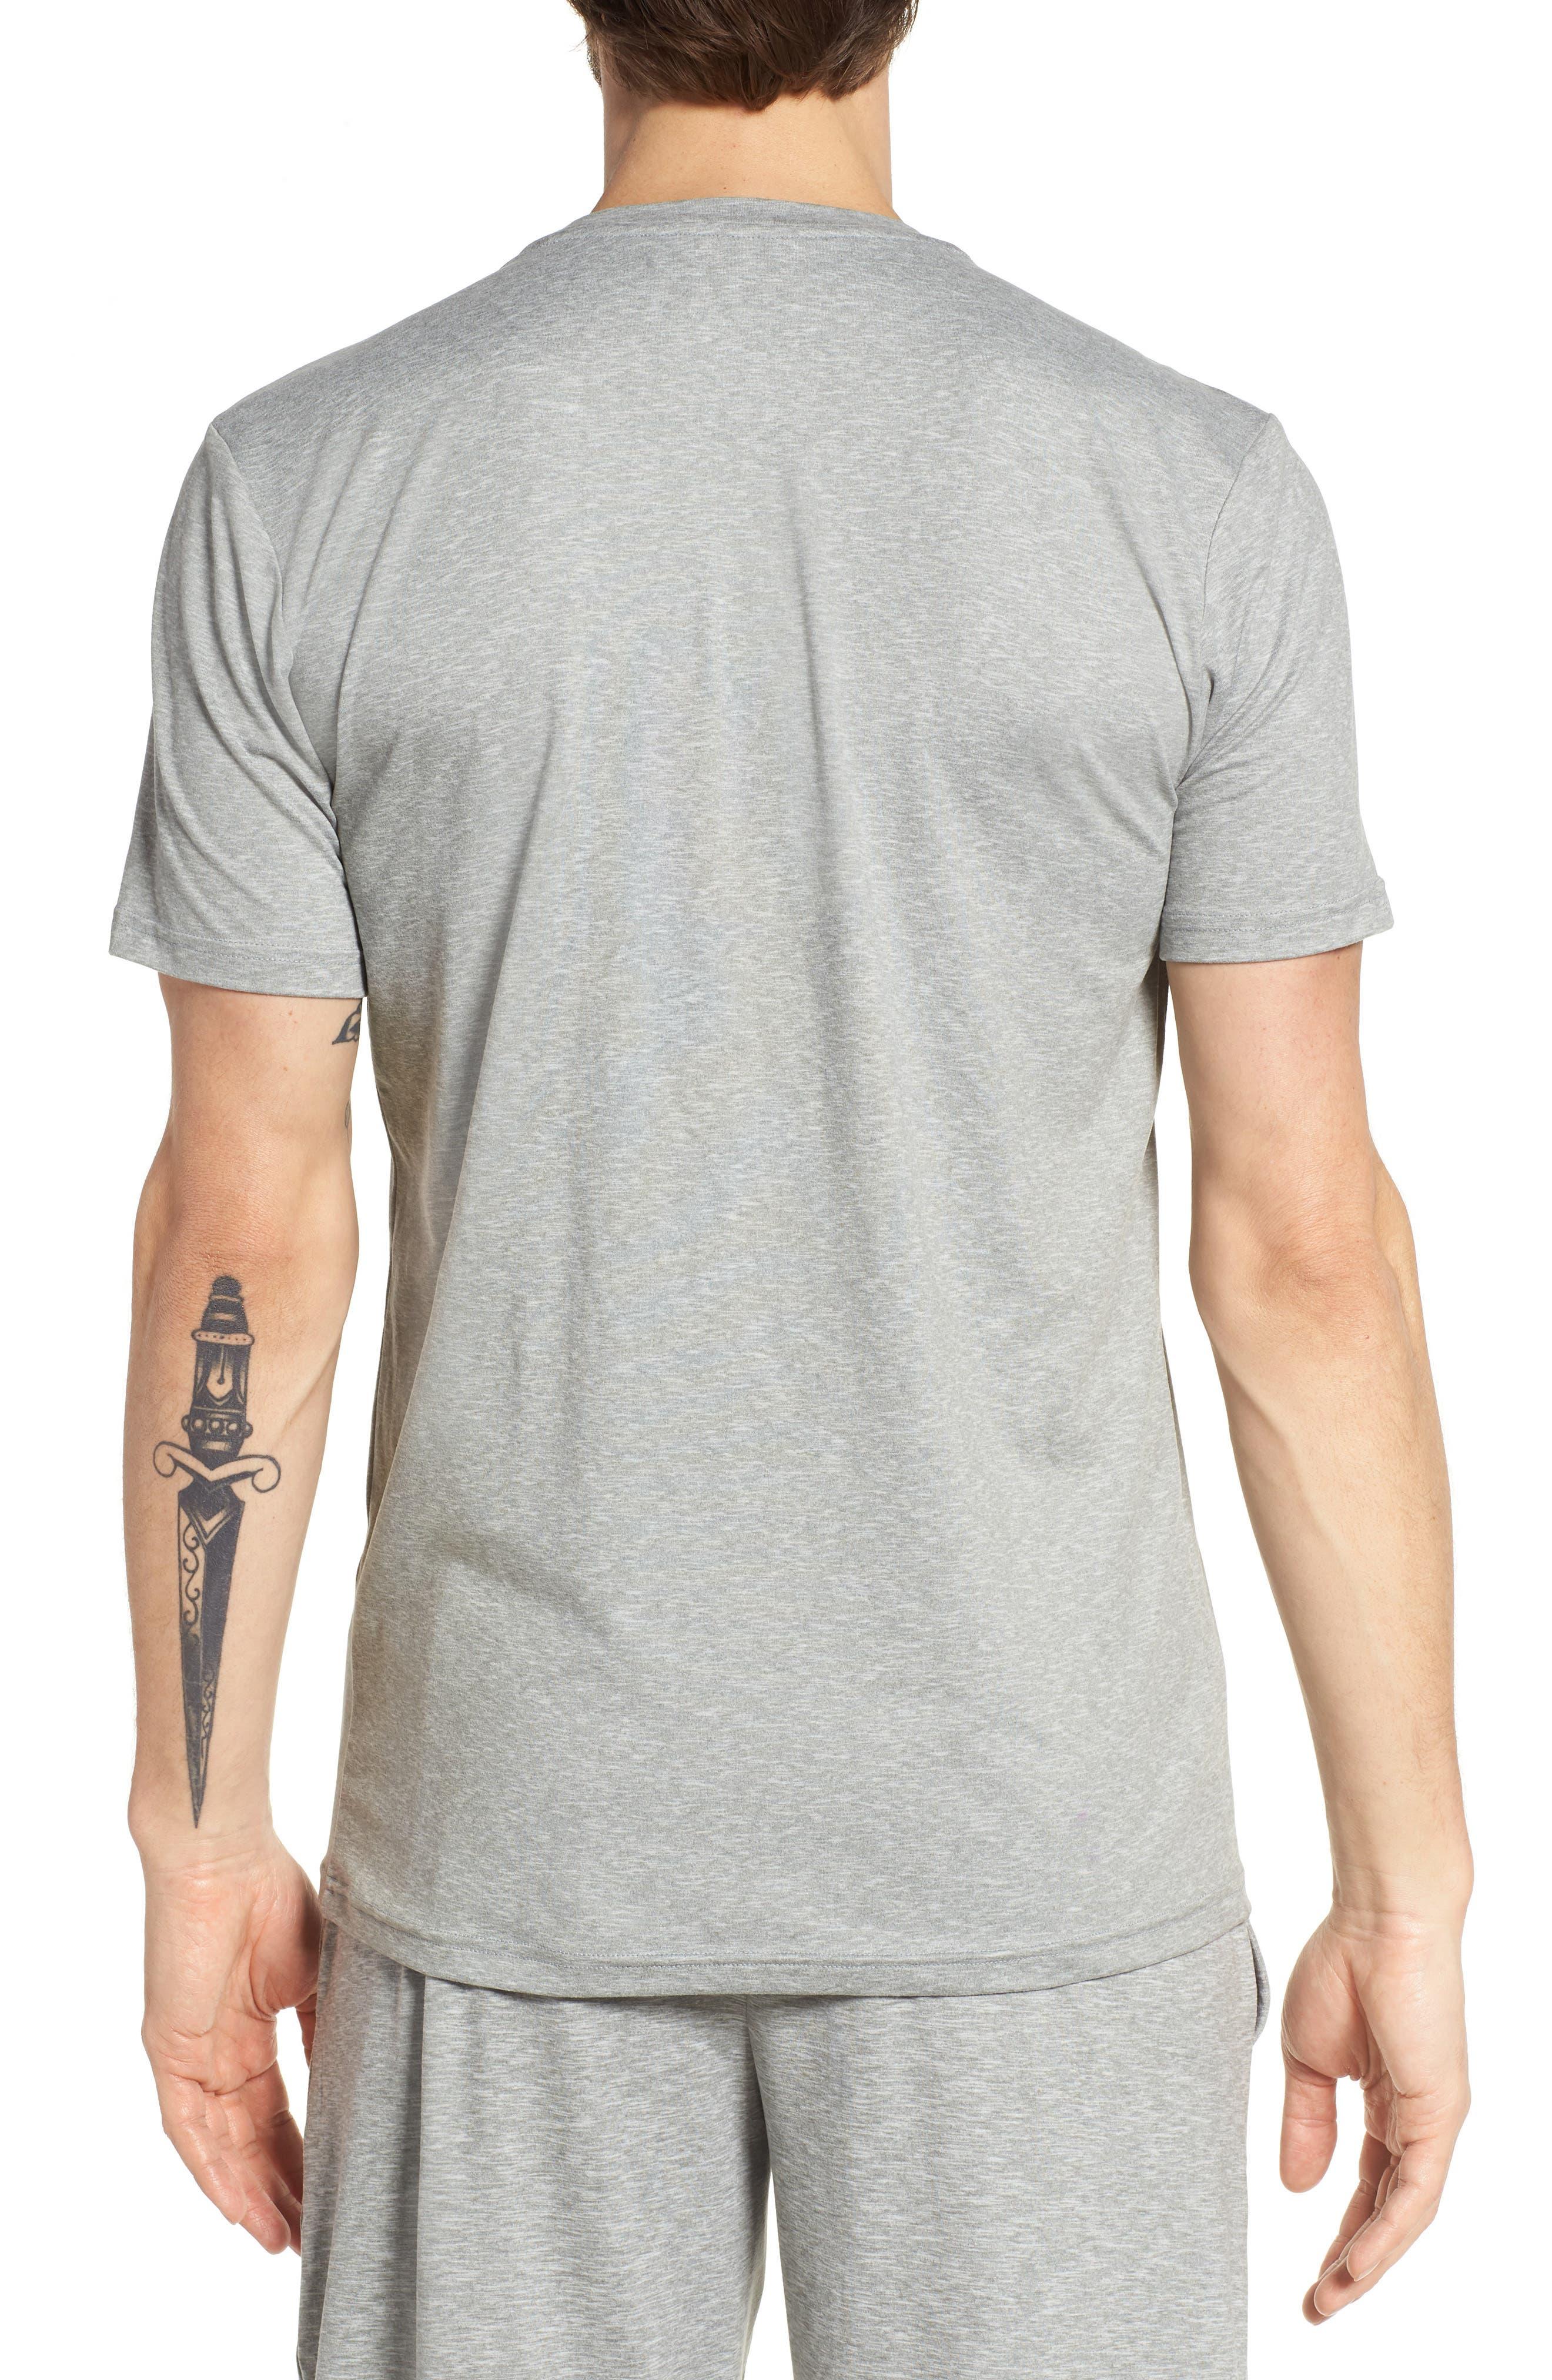 Therma Sleep Crewneck T-Shirt,                             Alternate thumbnail 2, color,                             Andover Heather/ Nevis